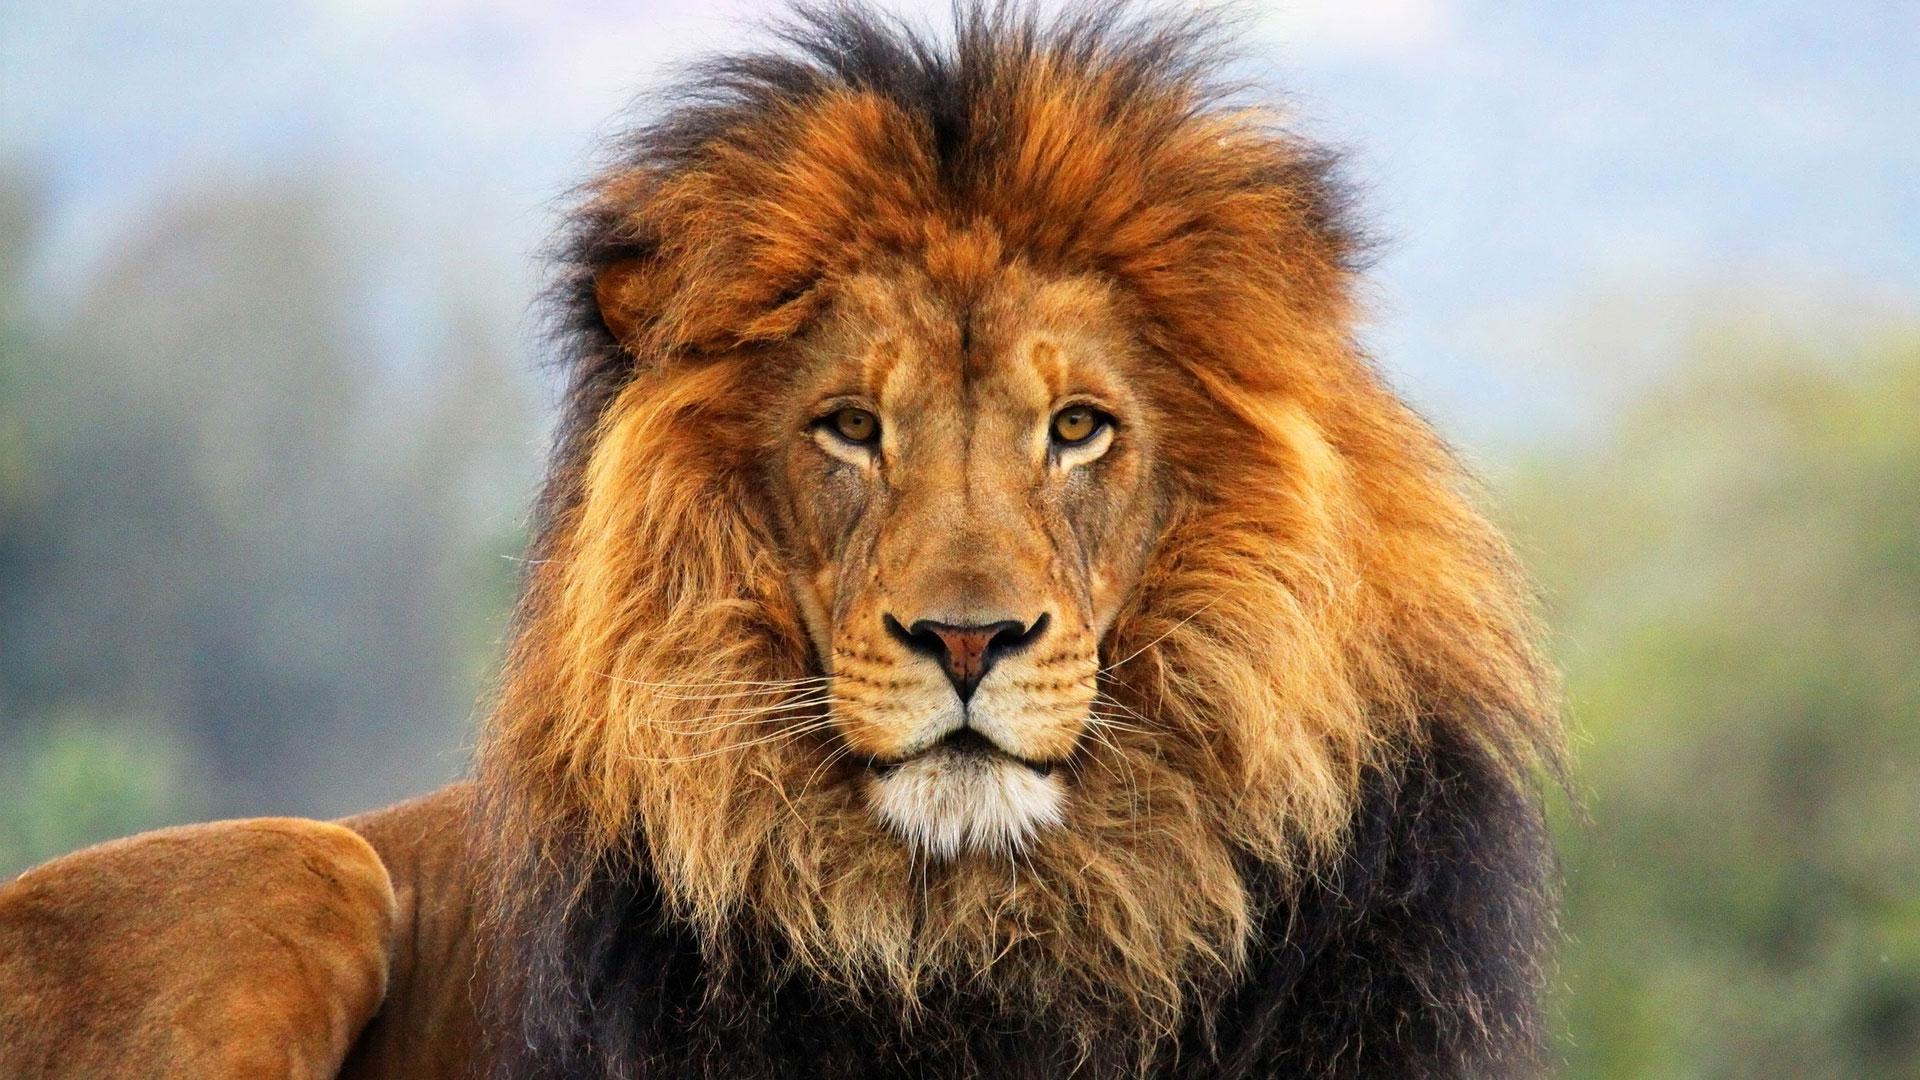 lion-desktop-wallpaper8.jpg